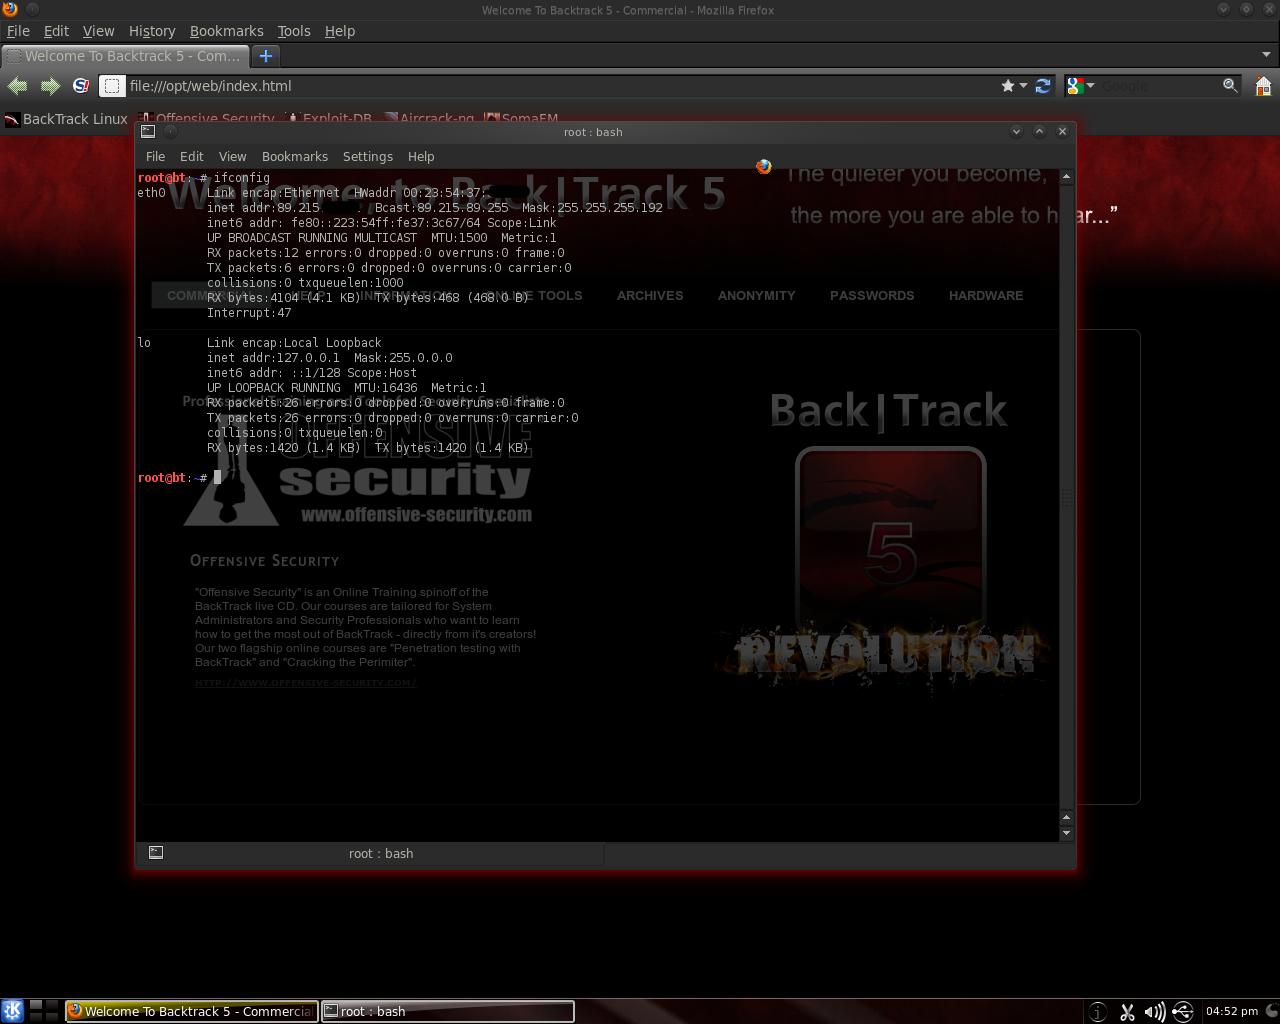 changer adresse mac backtrack 5